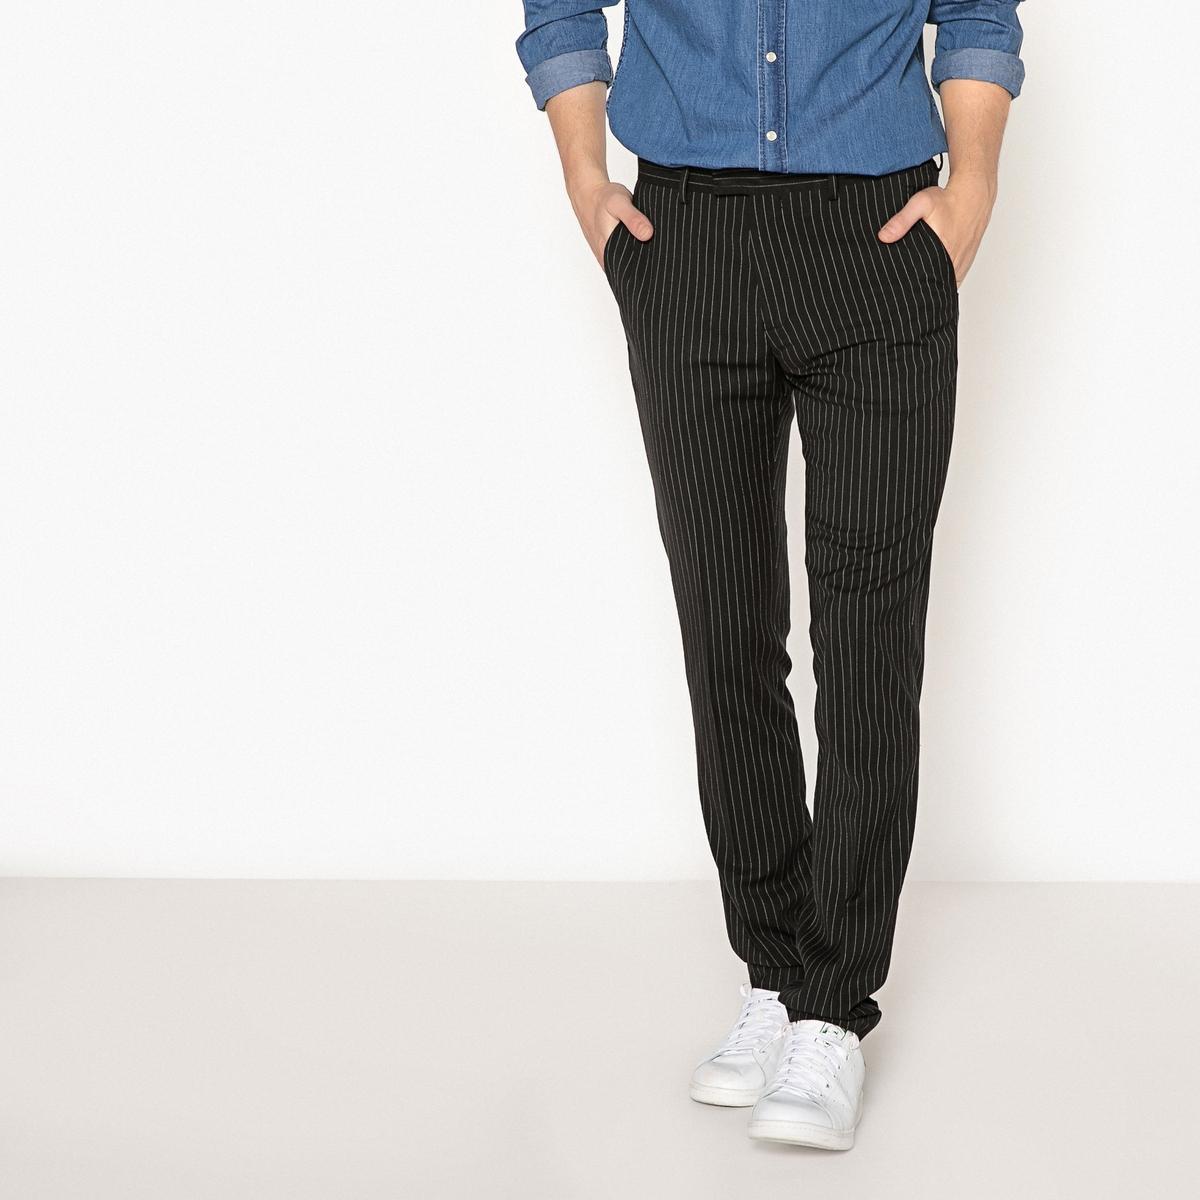 Pantaloni a righe